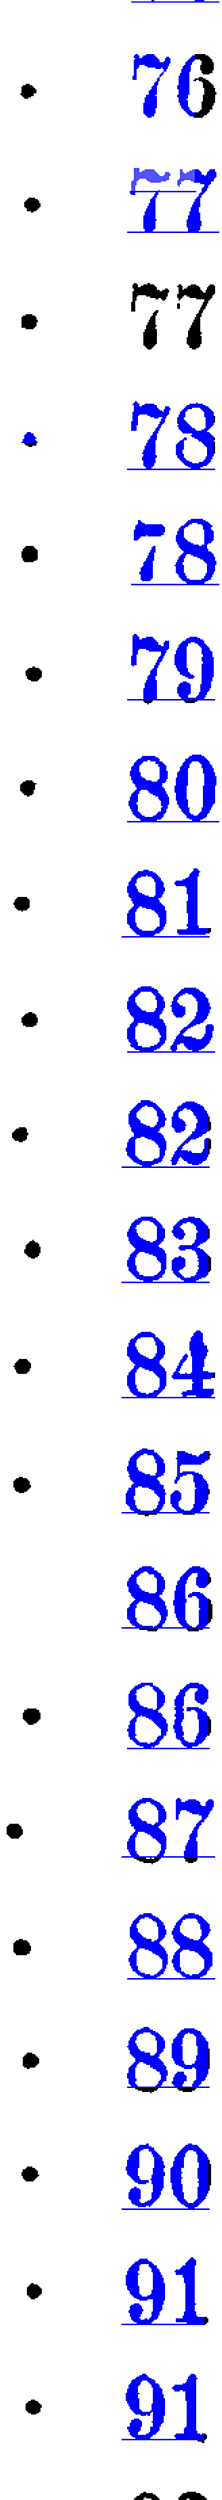 [merged small][merged small][ocr errors][ocr errors][merged small][merged small][merged small][merged small][merged small][merged small][merged small][merged small][merged small][merged small][merged small]